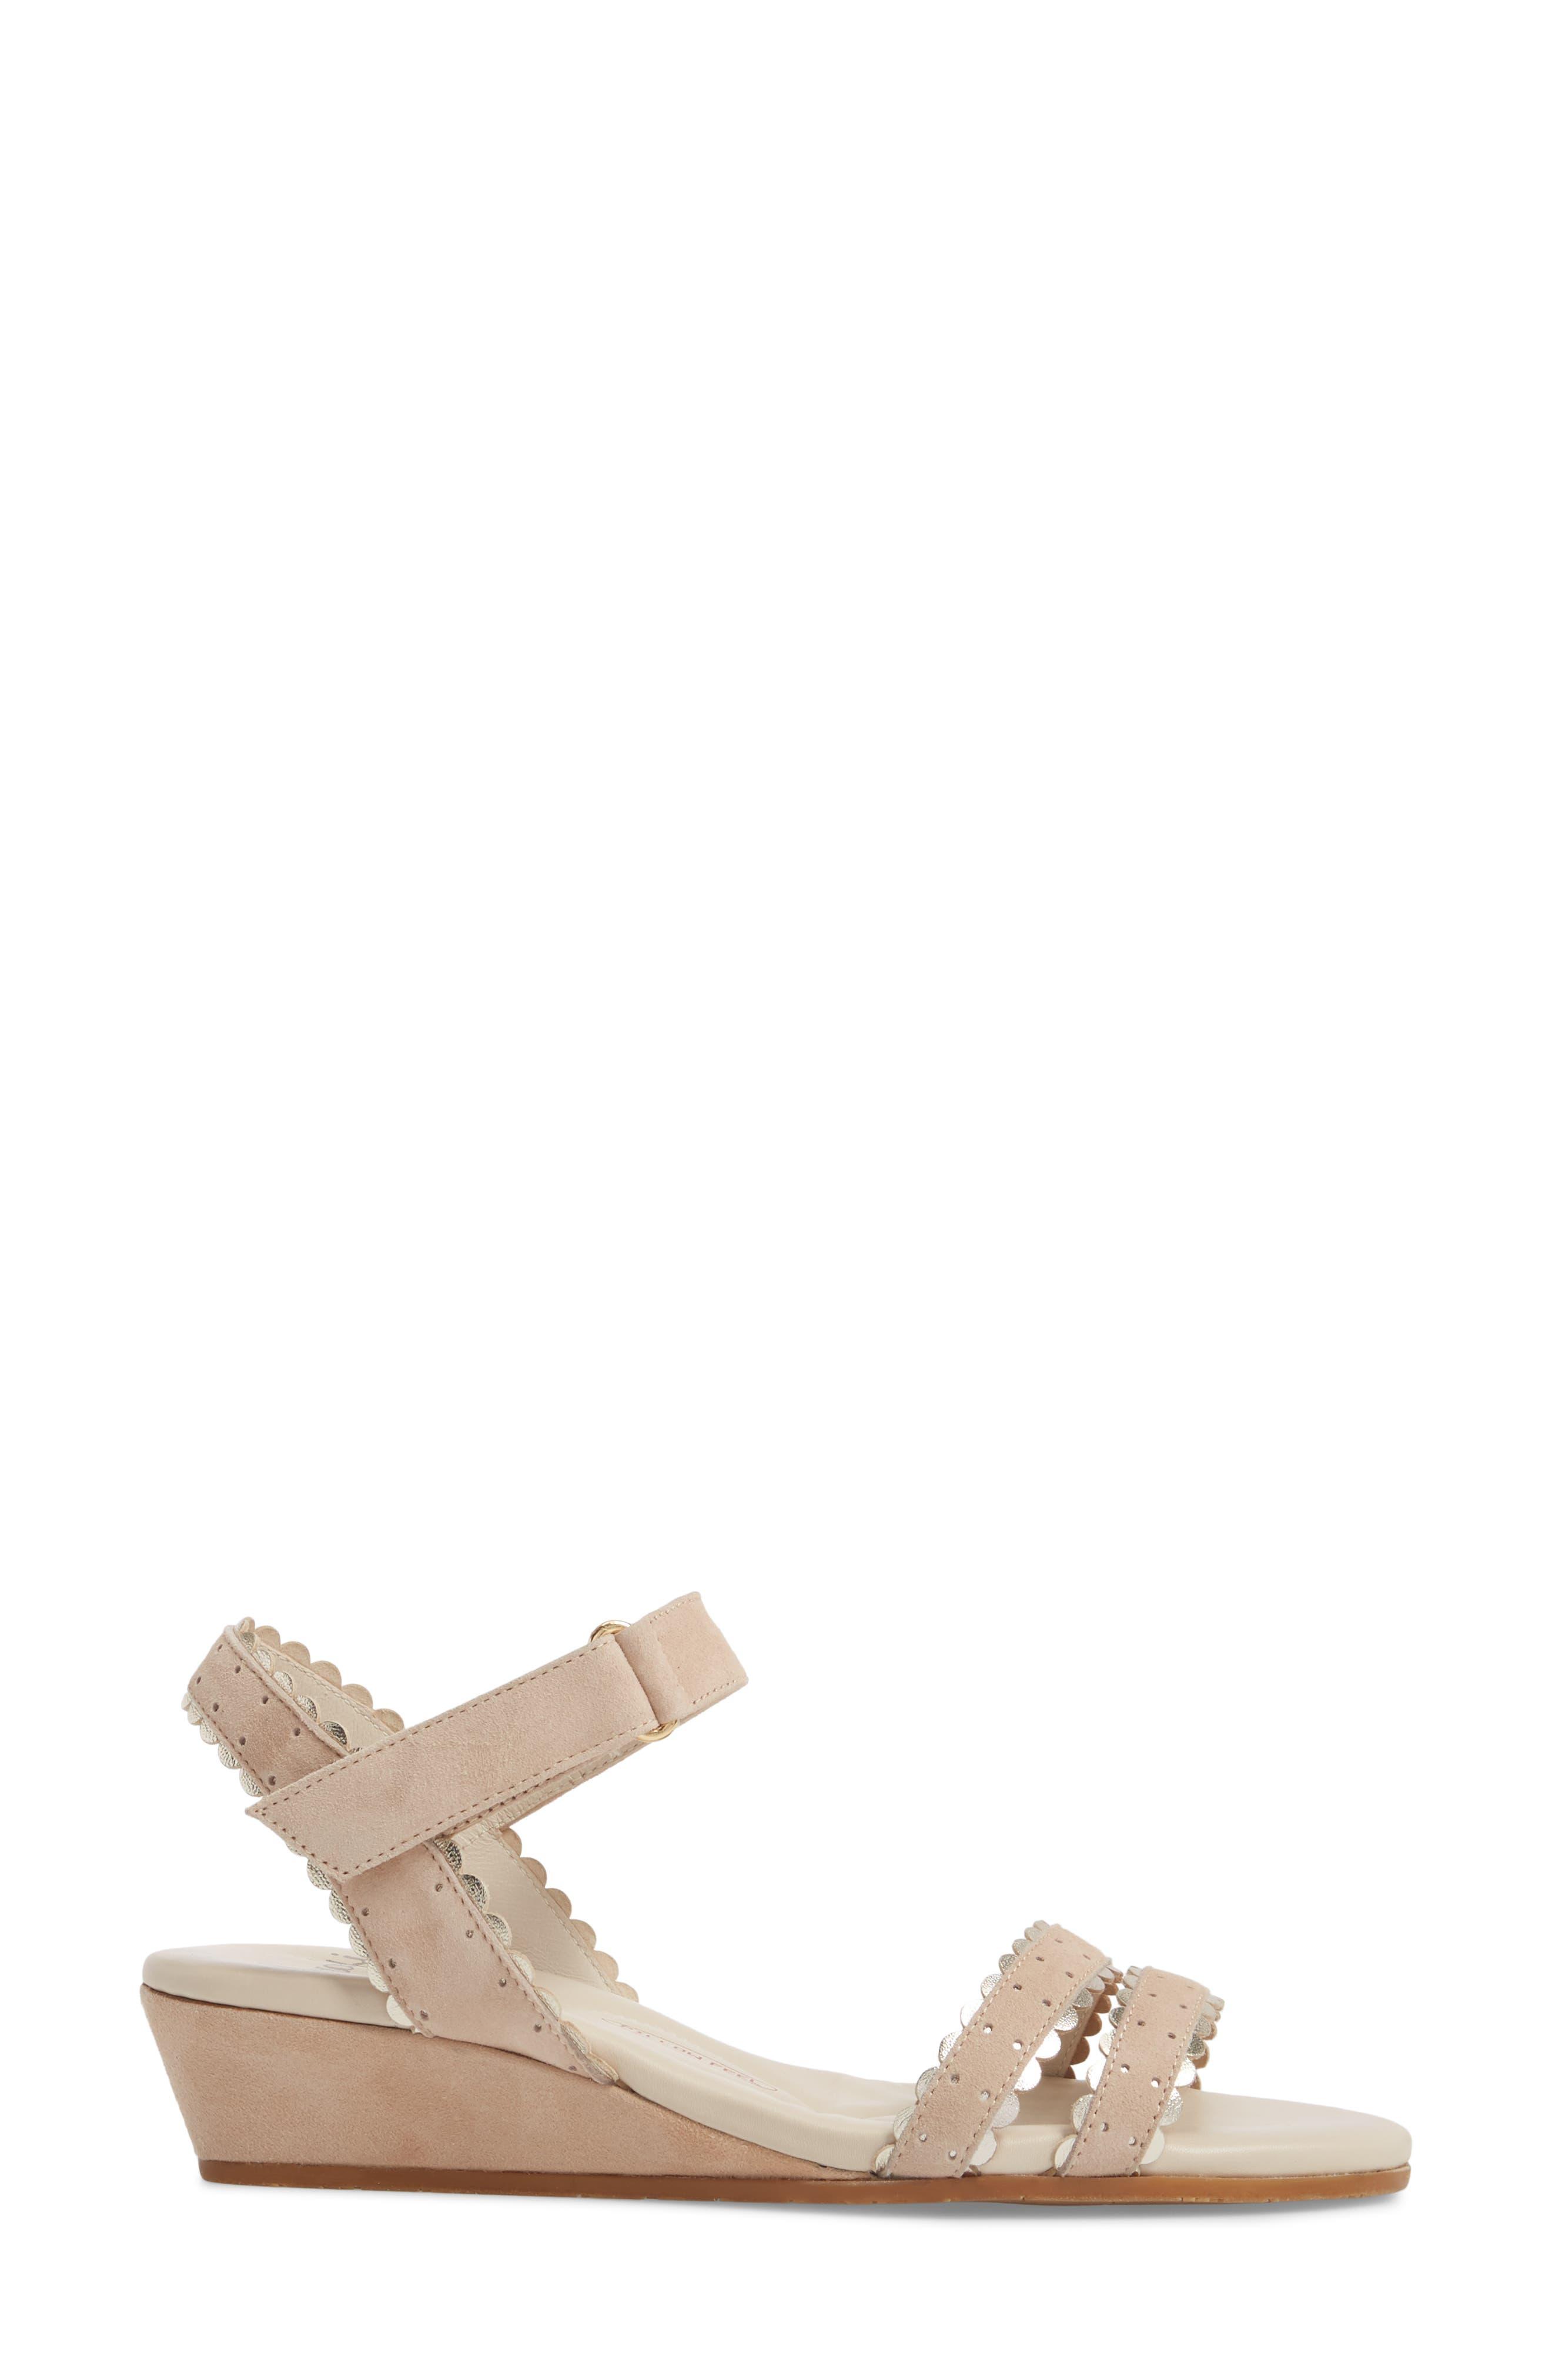 Messina Wedge Sandal,                             Alternate thumbnail 3, color,                             Cream/ Platinum Suede